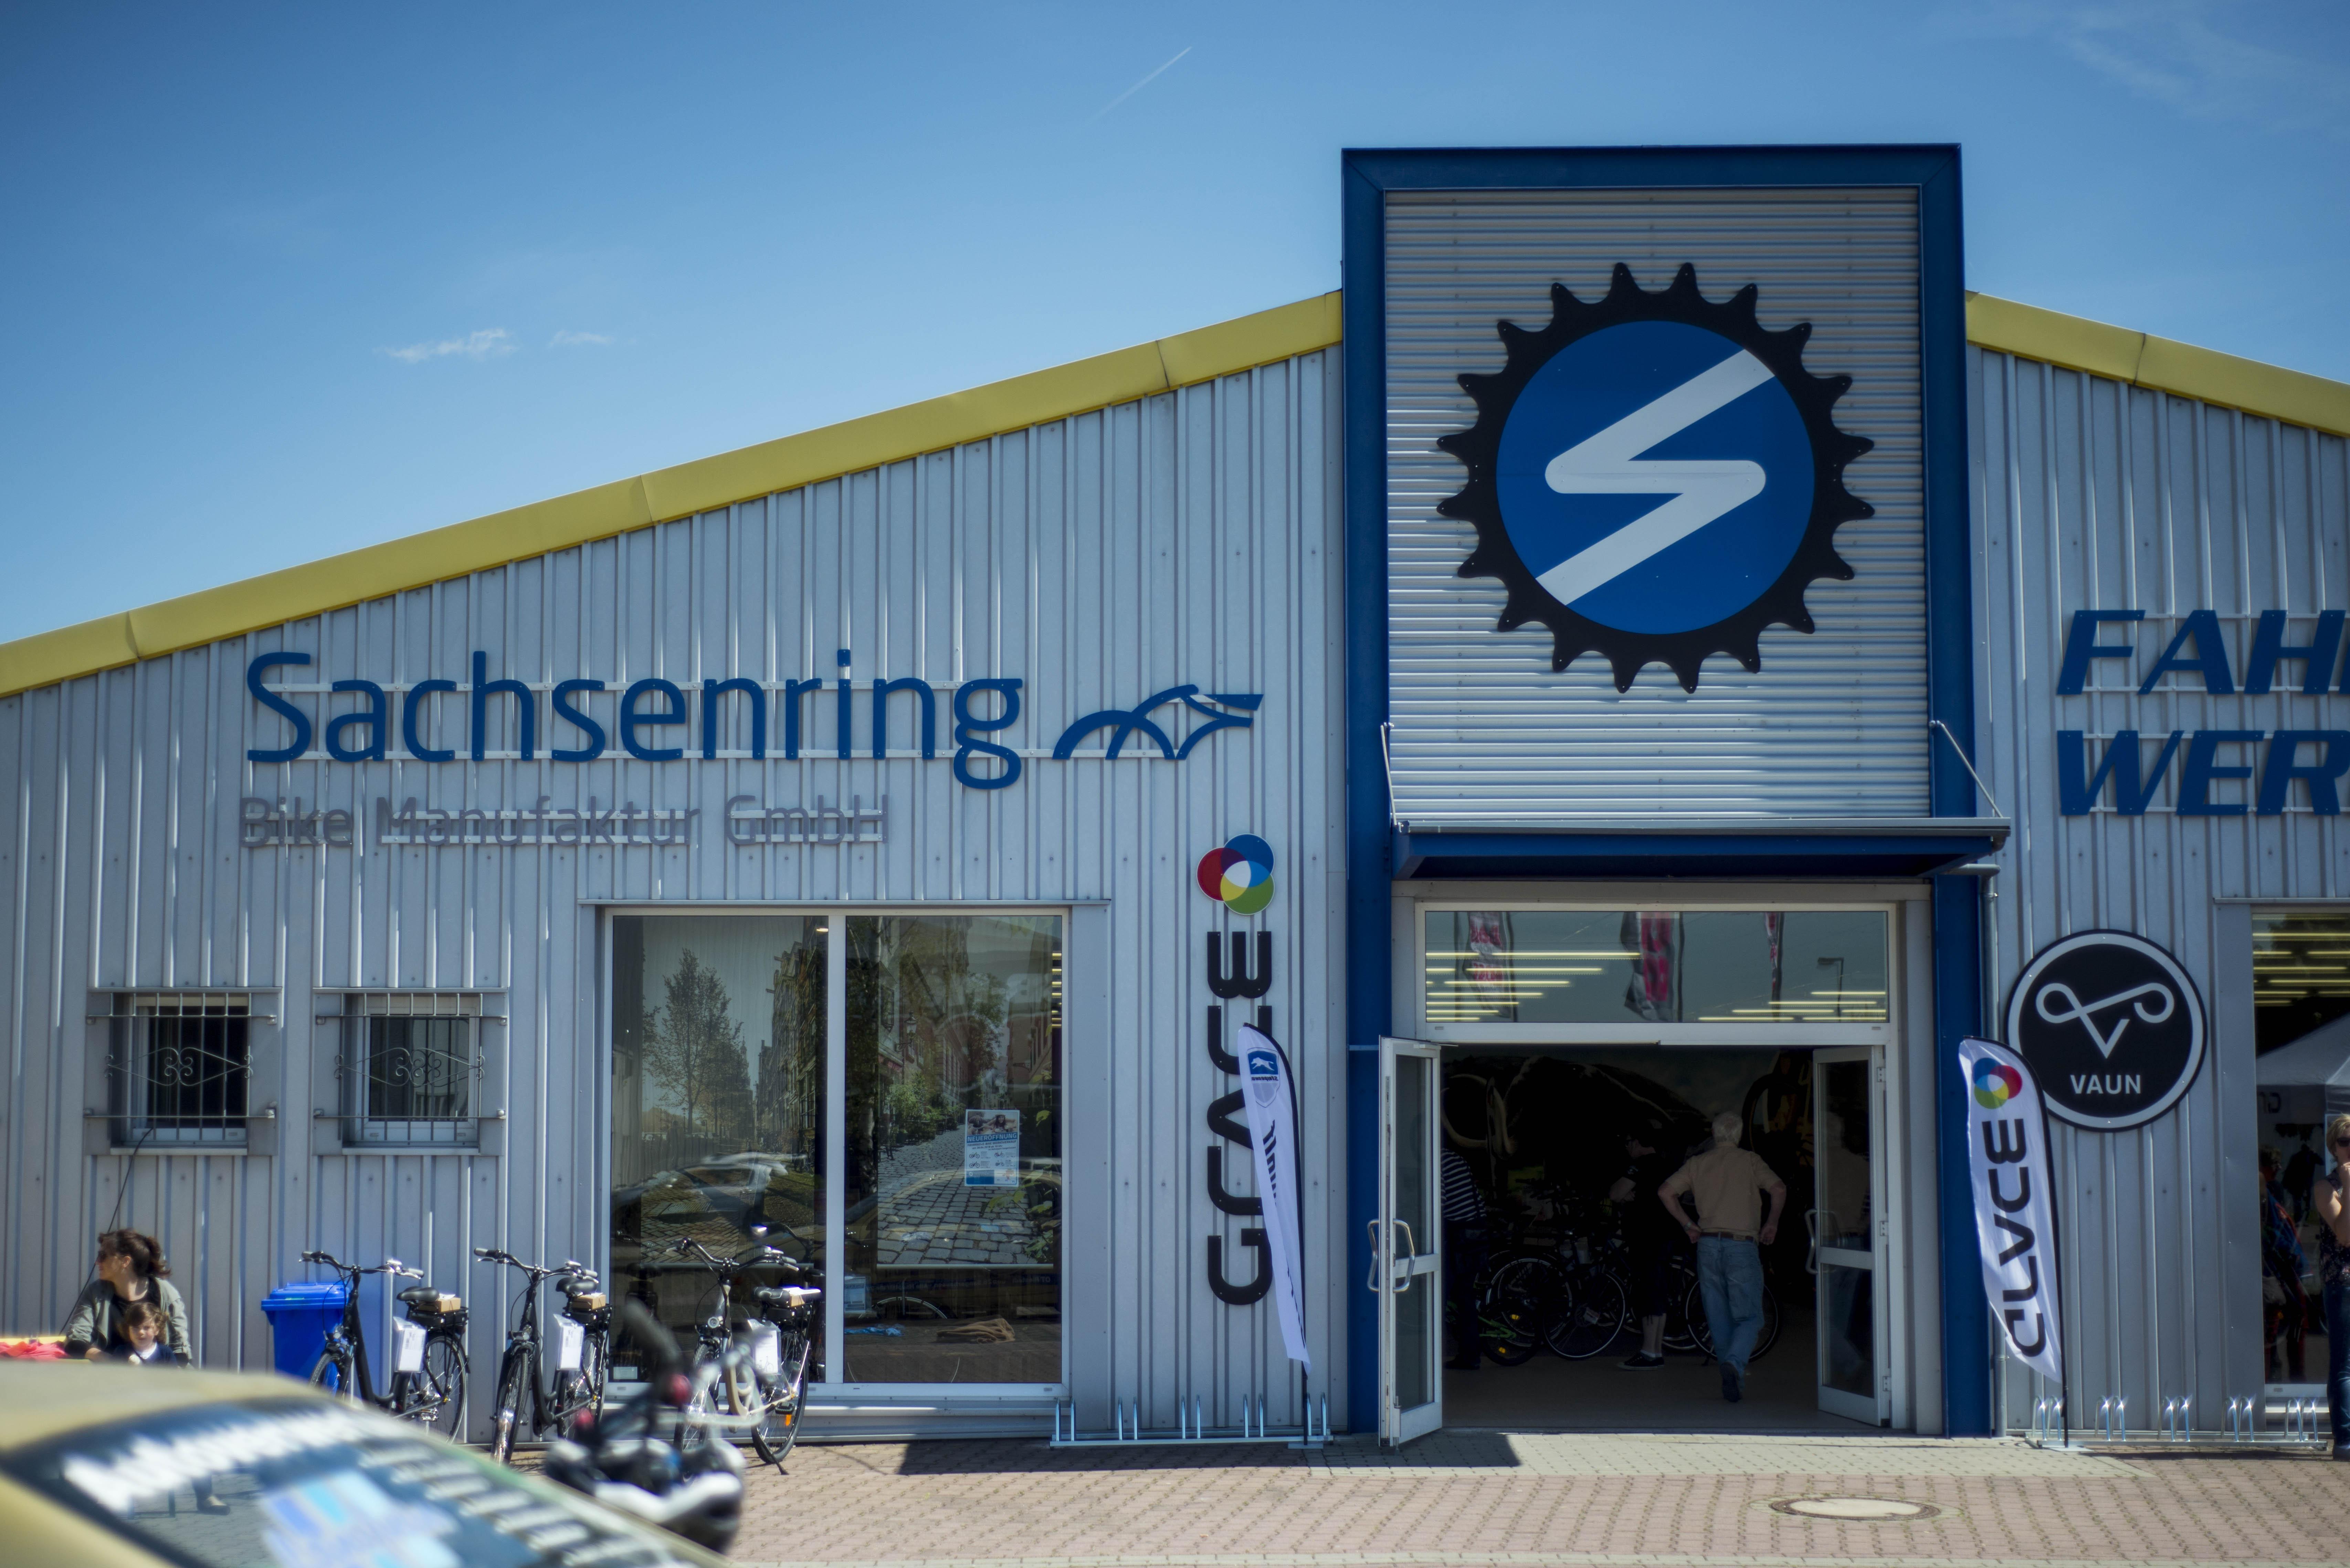 Sachsenring Bike Manufaktur - Eingang Werksverkauf in Sangerhausen